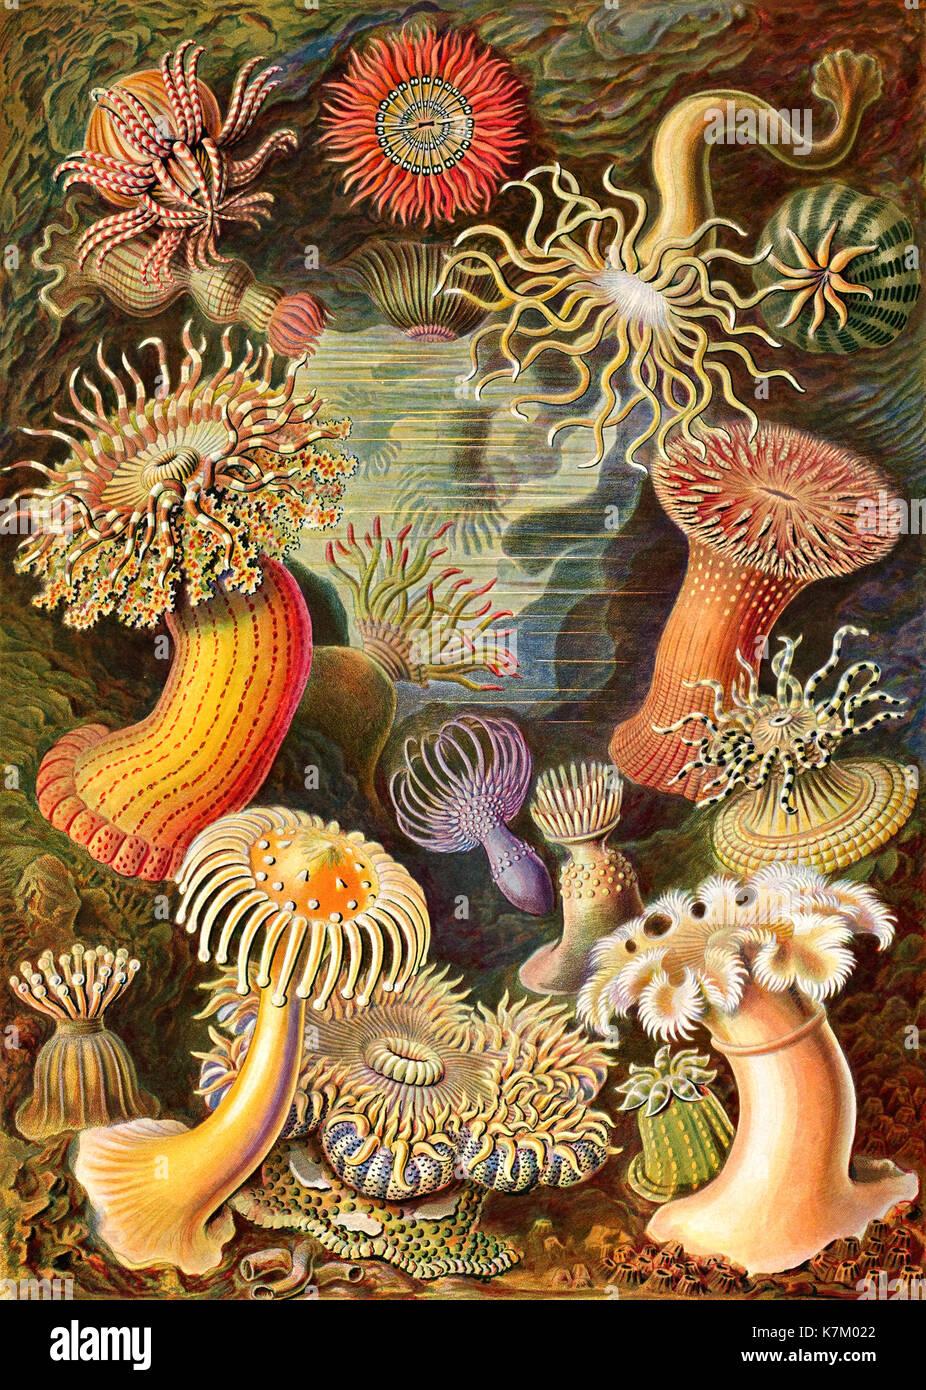 ERNST HAECKEL (1834-1919) German biologist, physician,naturalist. Sea anemones from his Kunstformen de Natur (Art forms of nature) published 1904 - Stock Image